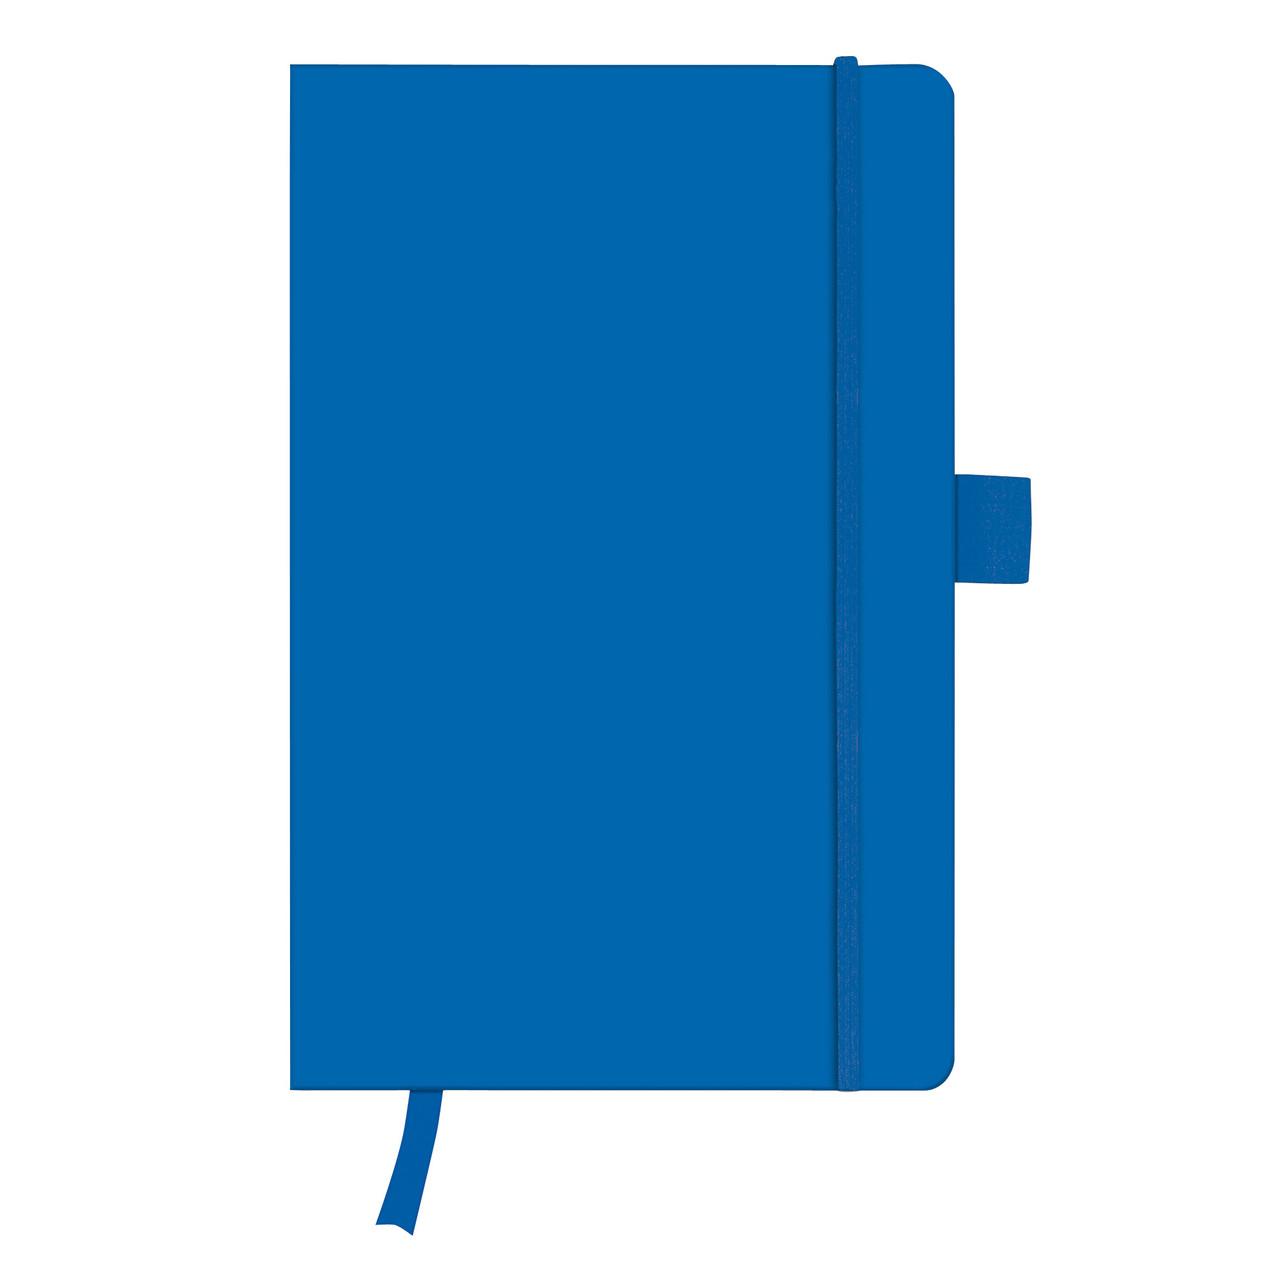 Записная книга Herlitz А5 96л My.Book Classic Blue клетка обложка имитация кожи (11369097)